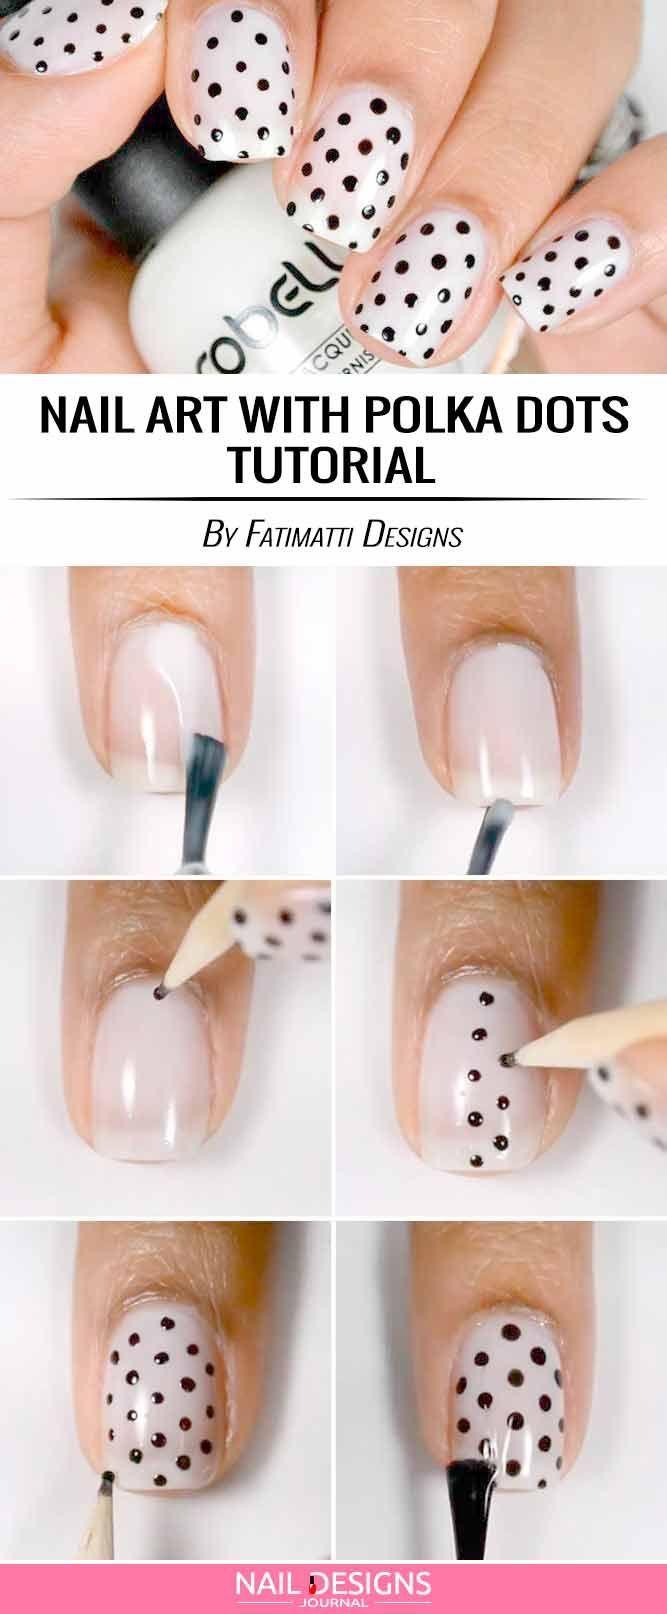 17 Super Easy Nail Designs DIY Tutorials | Pinterest | Fun nails and ...